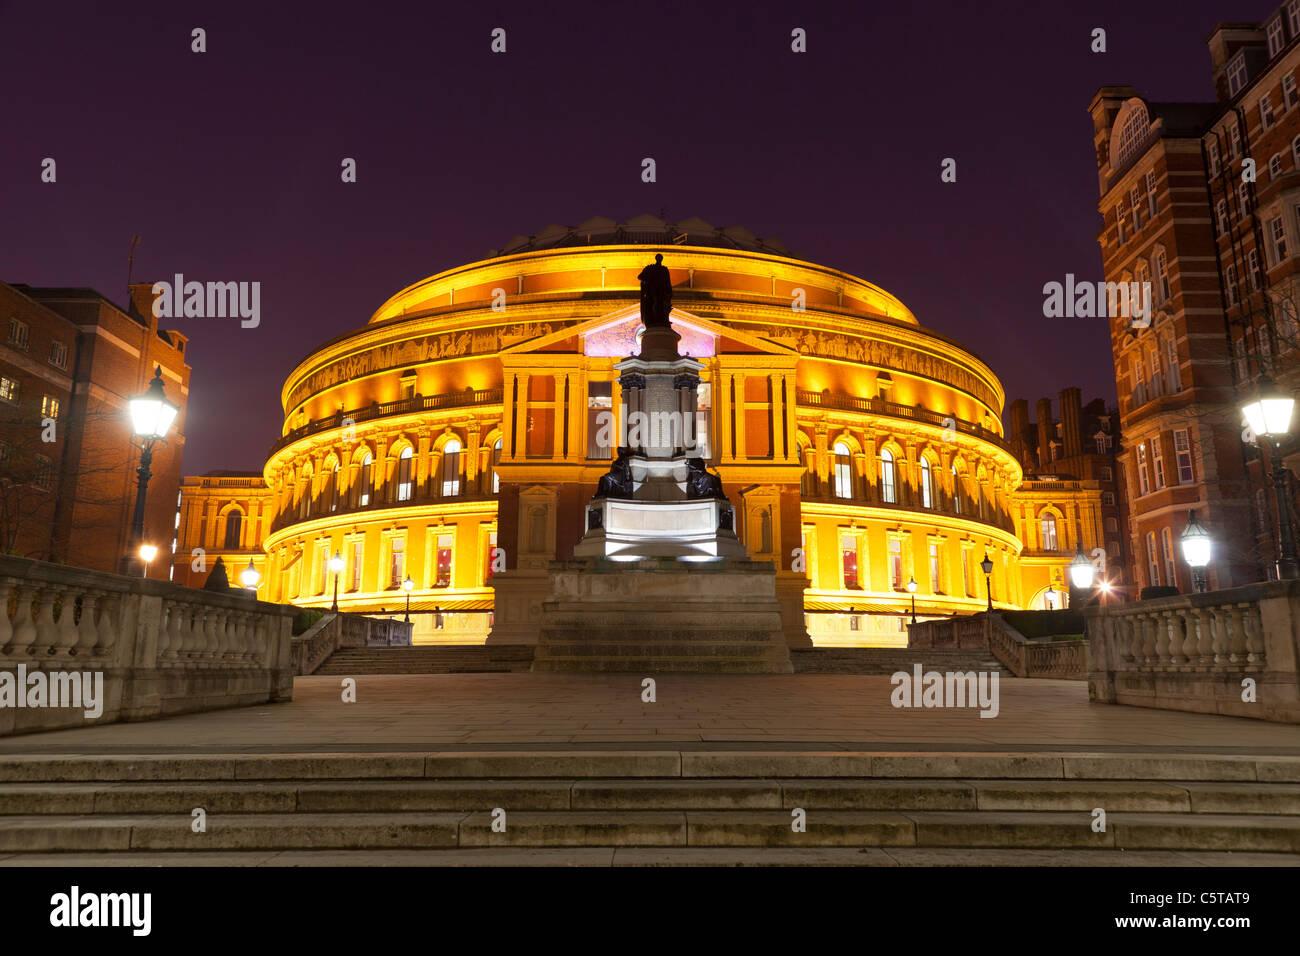 Royal Albert Hall at dusk with lights London UK - Stock Image